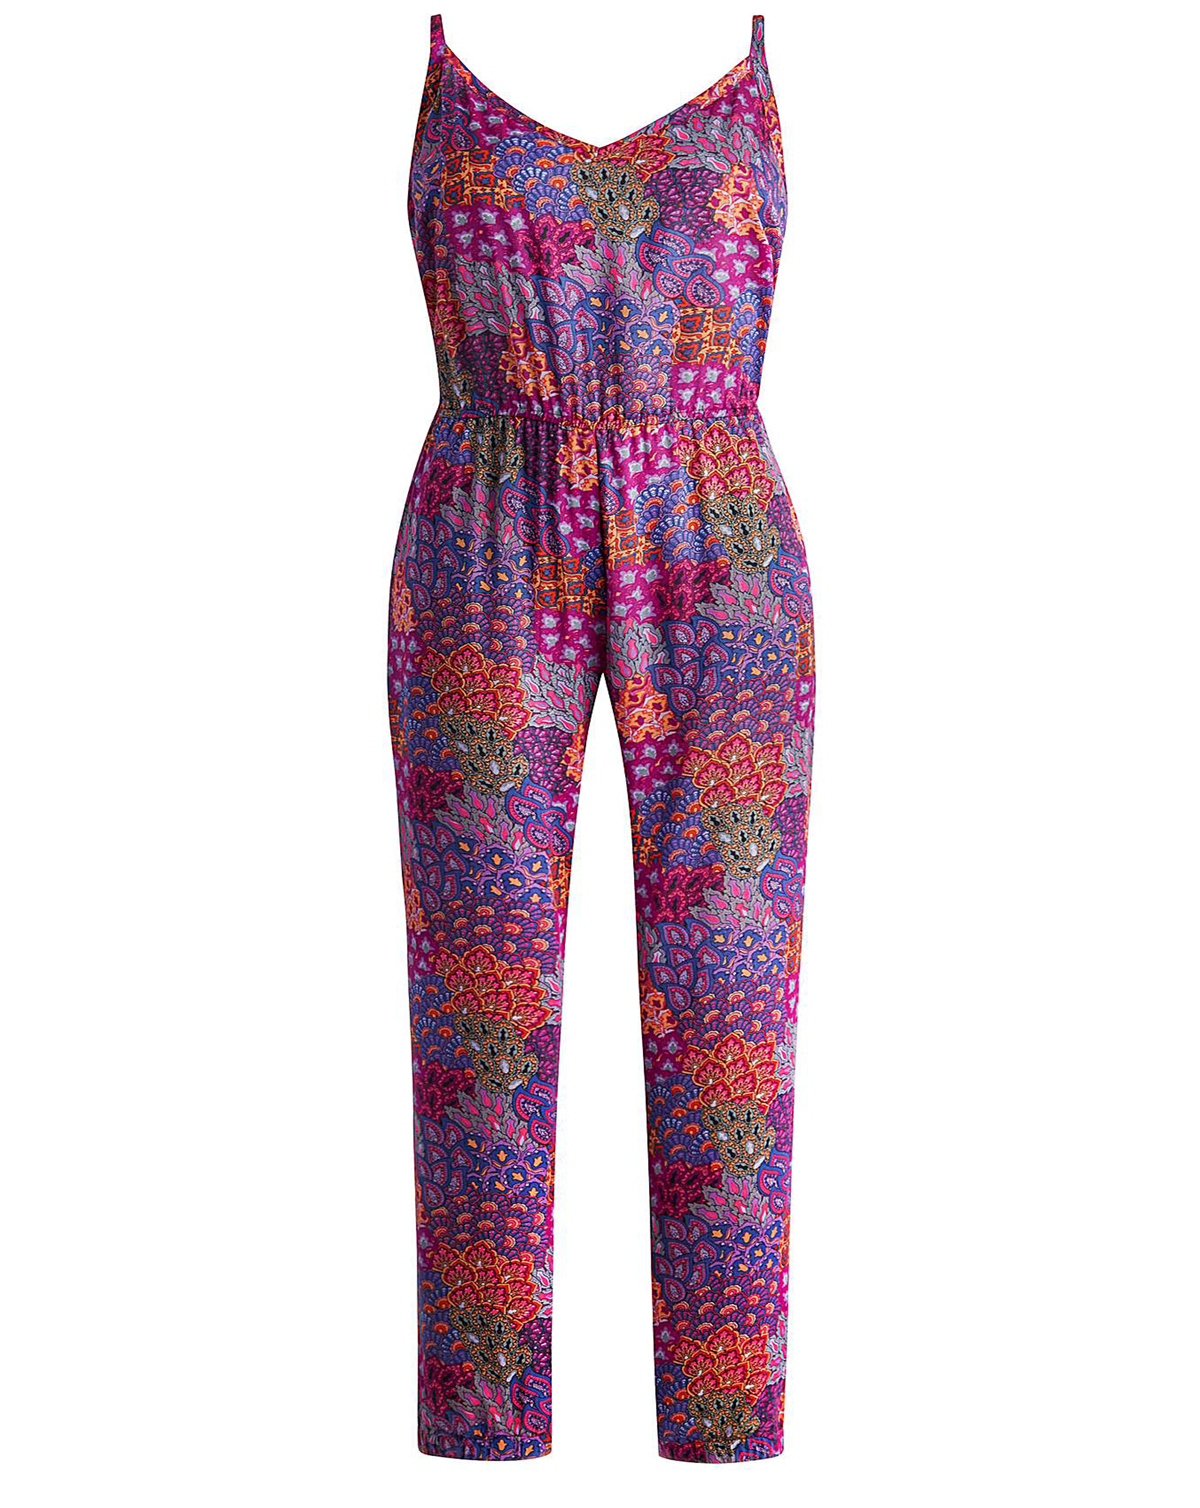 a9acd68851a Joanna Hope - - Joanna Hope PURPLE Printed Cuffed Leg Jumpsuit - Plus Size  12 to 30